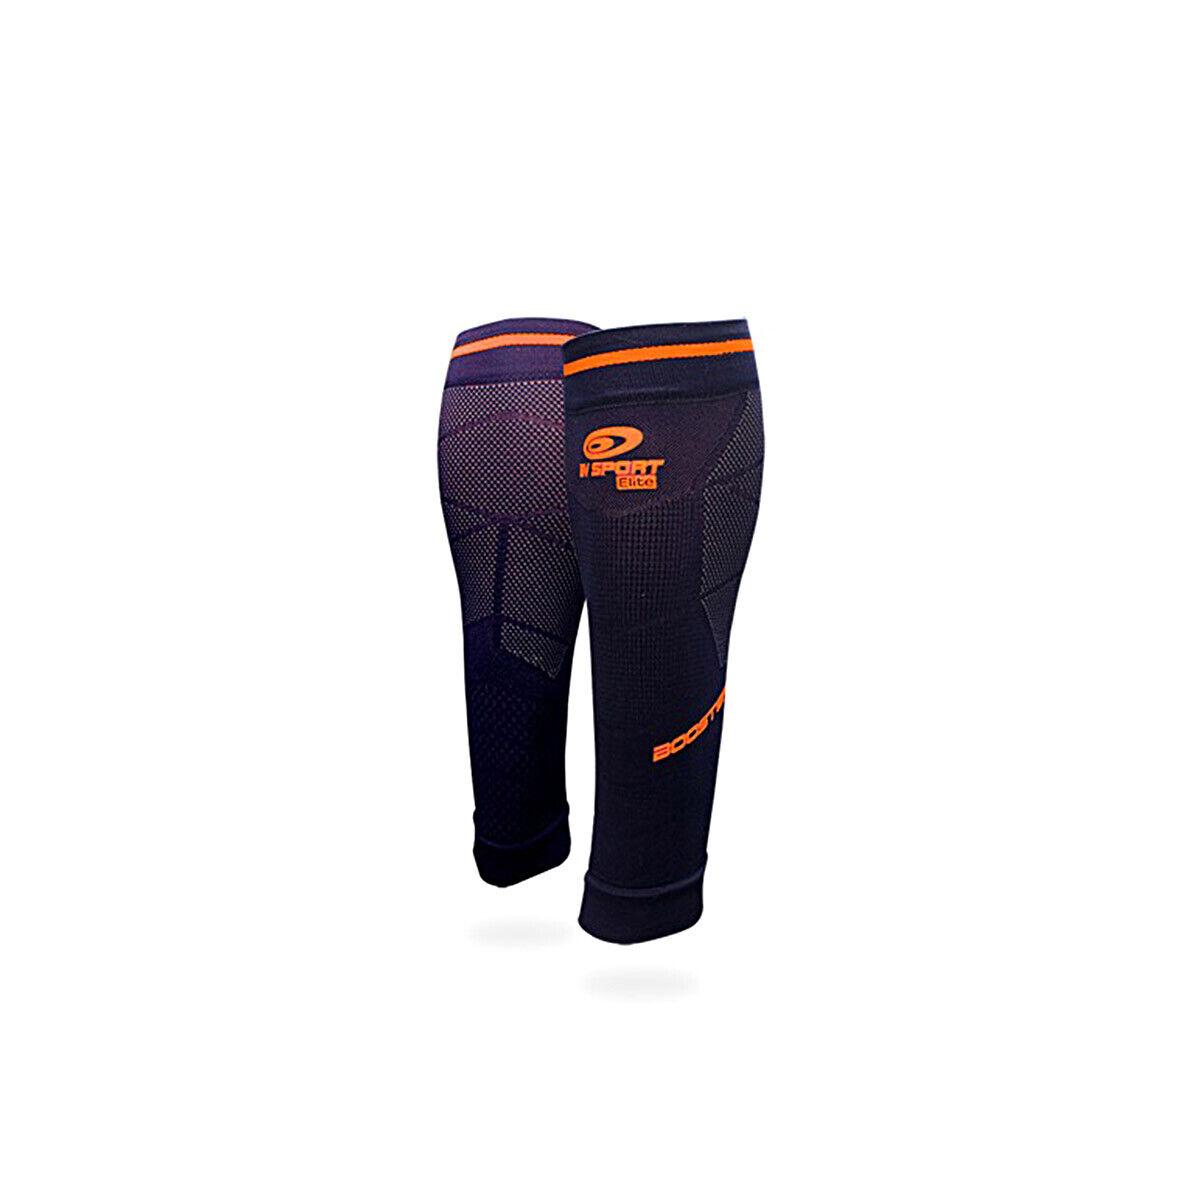 BV sport Elite EVO2 bluee orange  Booster 114 008  wholesale price